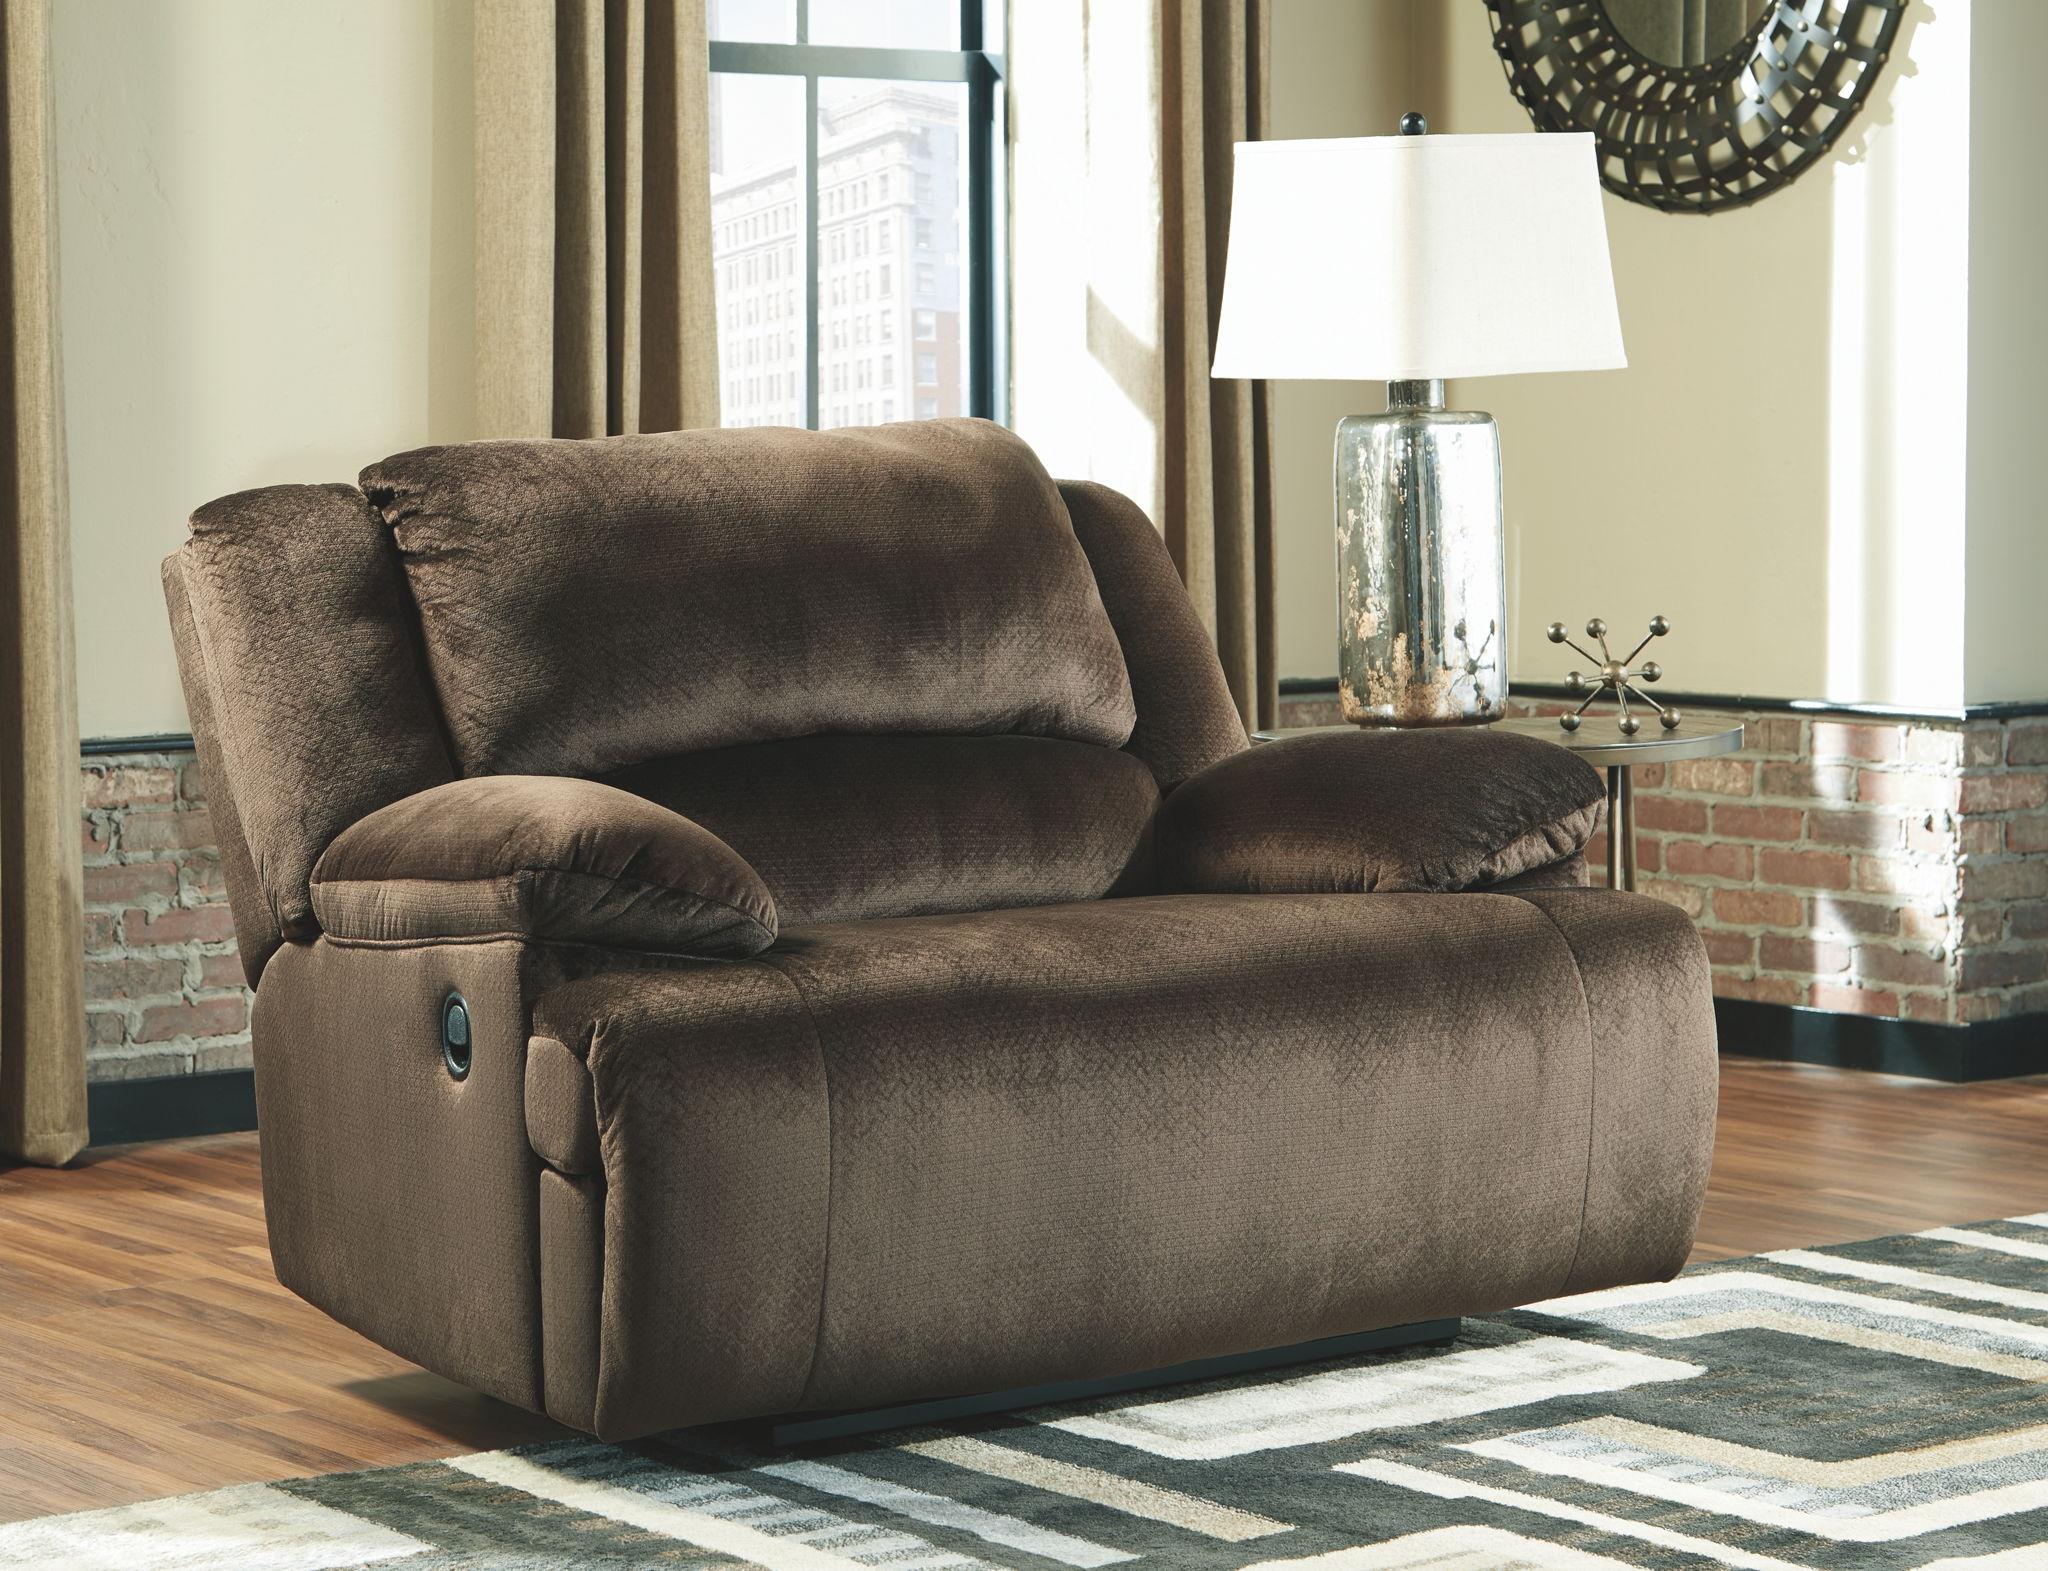 Prime Clonmel Chocolate Zero Wall Wide Seat Recliner Spiritservingveterans Wood Chair Design Ideas Spiritservingveteransorg